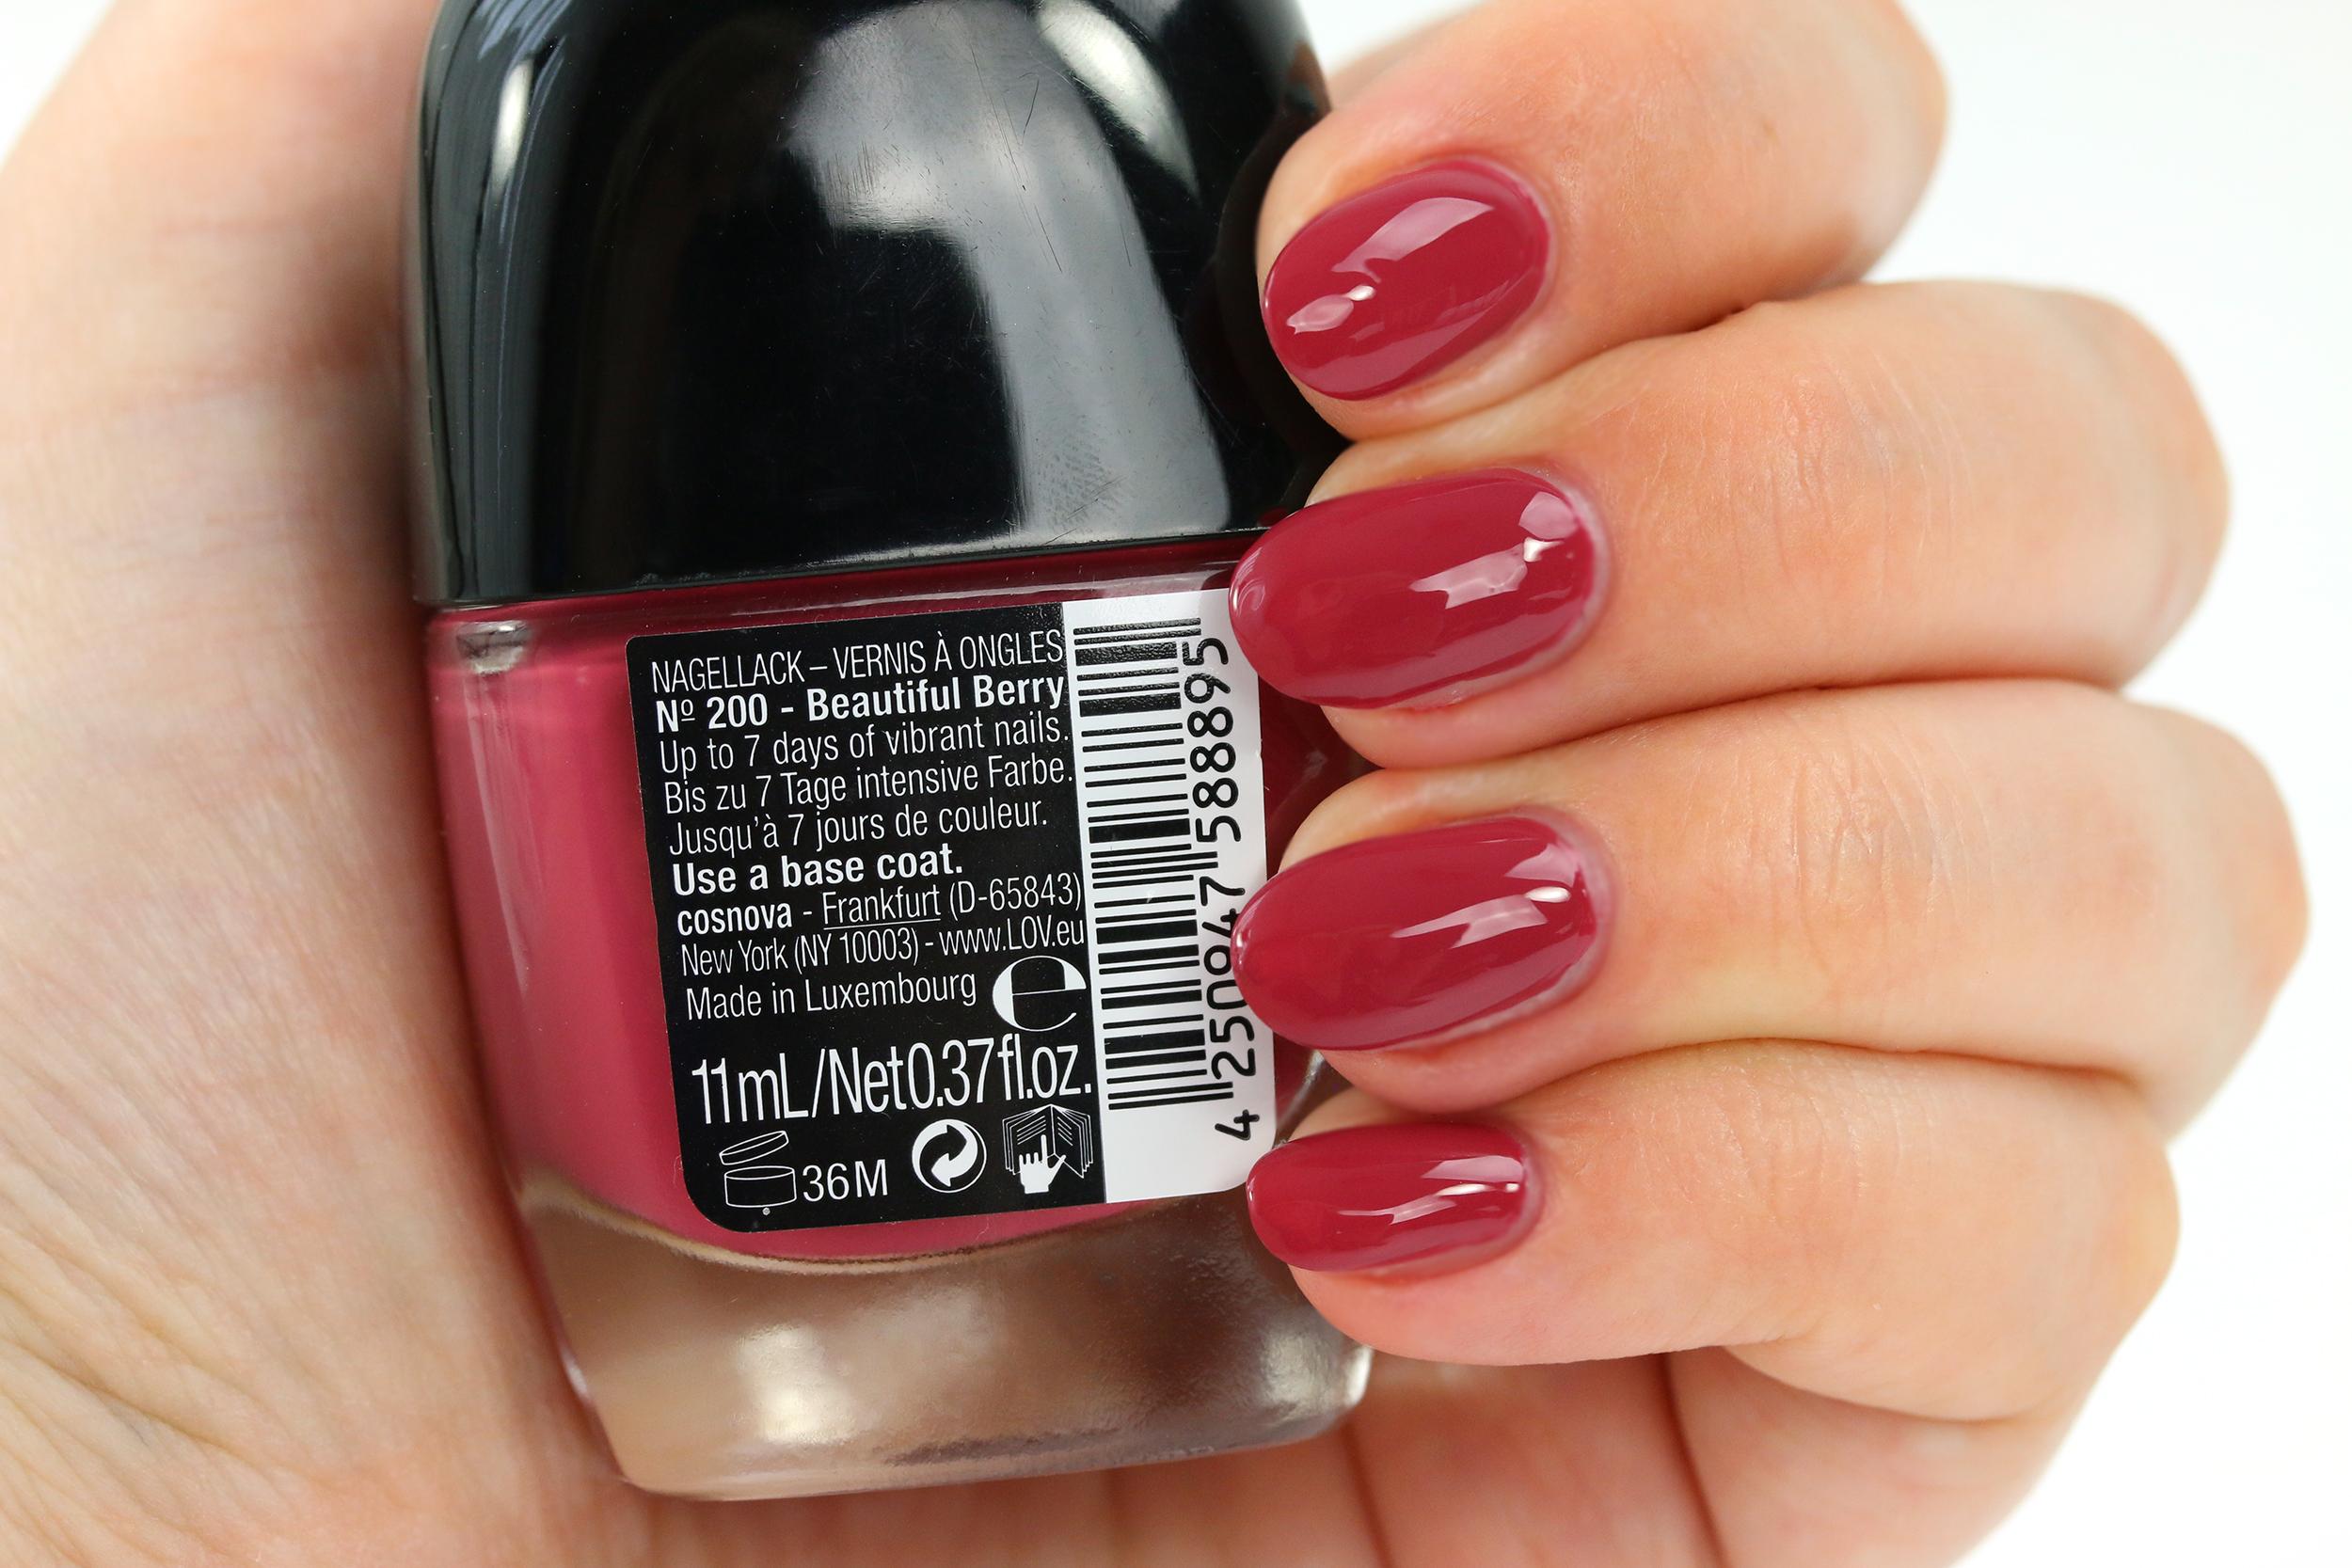 lov-nagellack-200-beautiful-berry